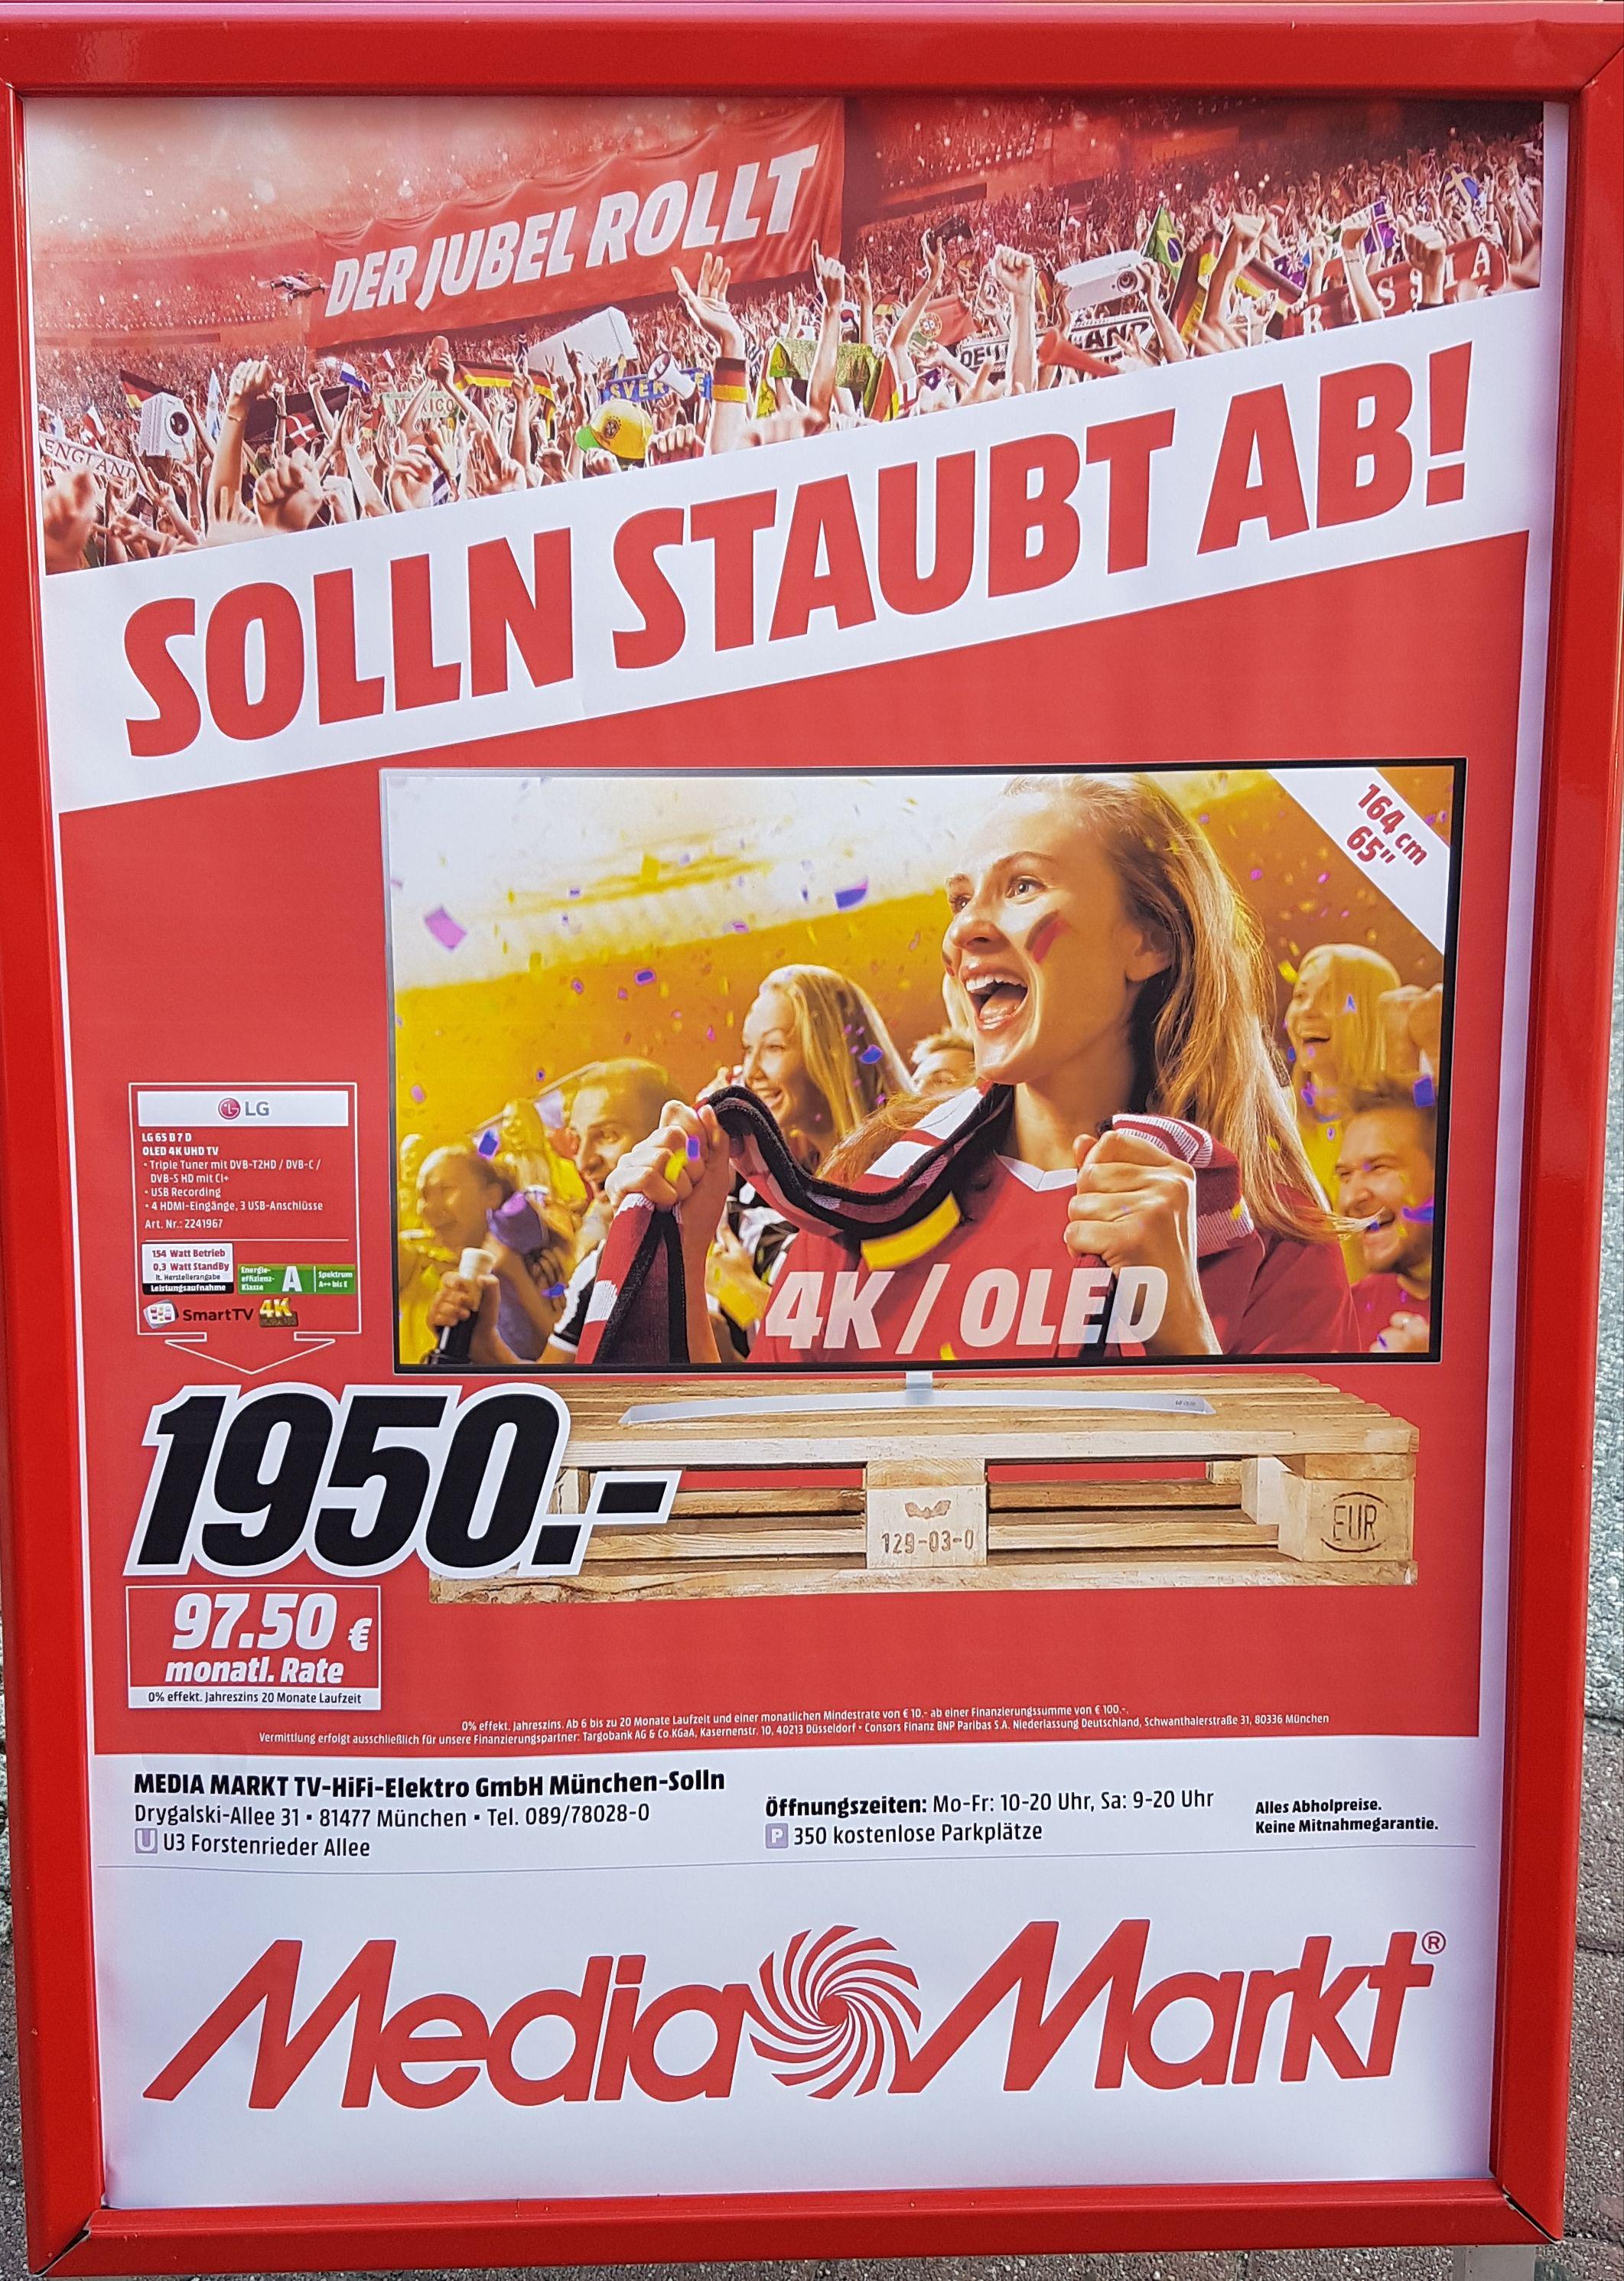 LG OLED 65B7D Media Matkt München-Solln